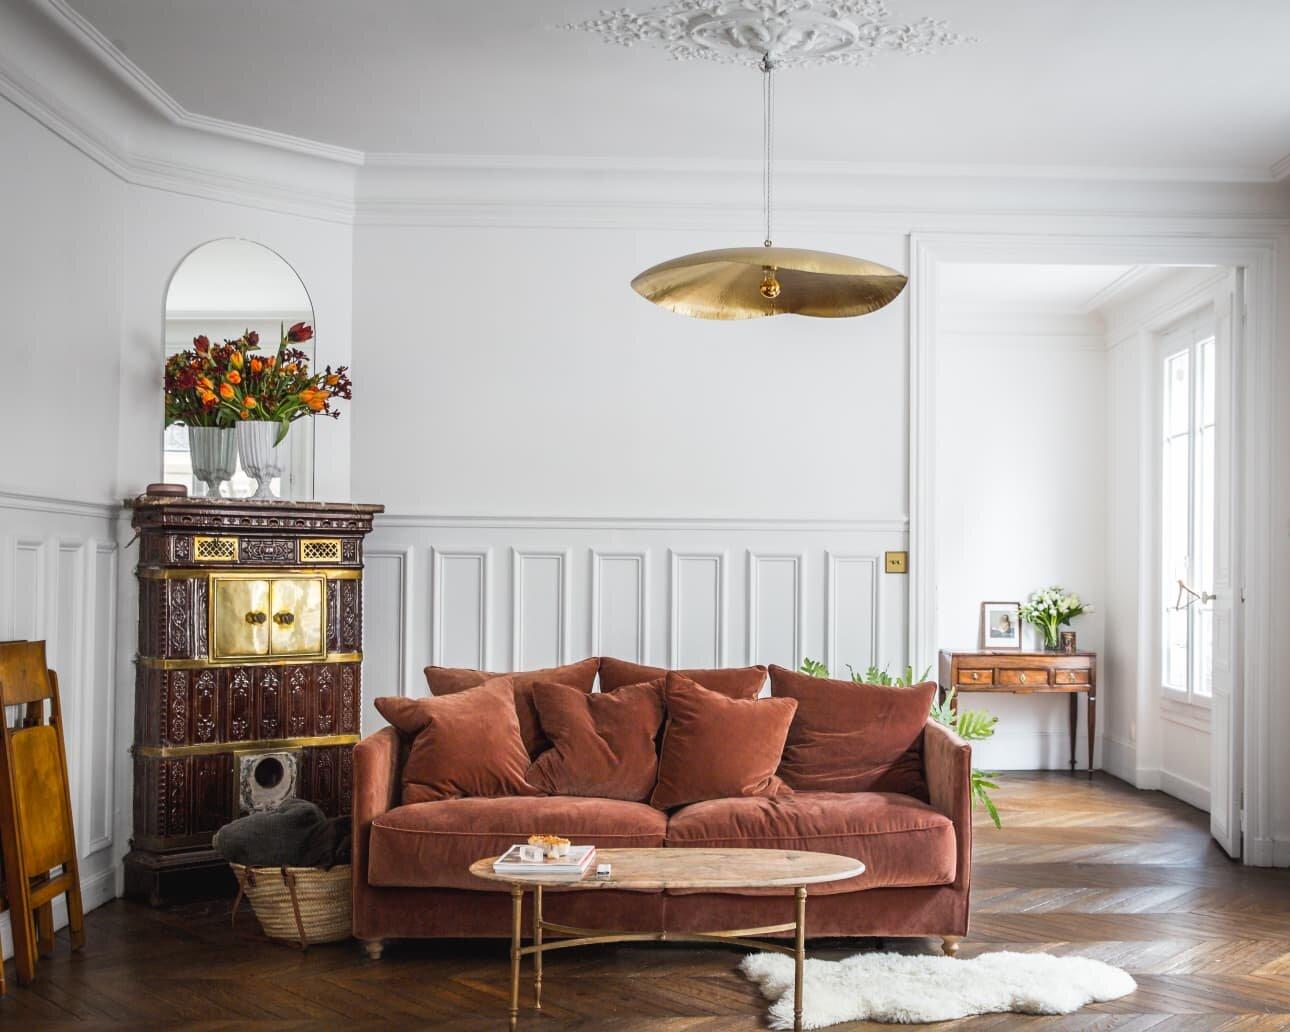 Chic and stylish Paris apartment